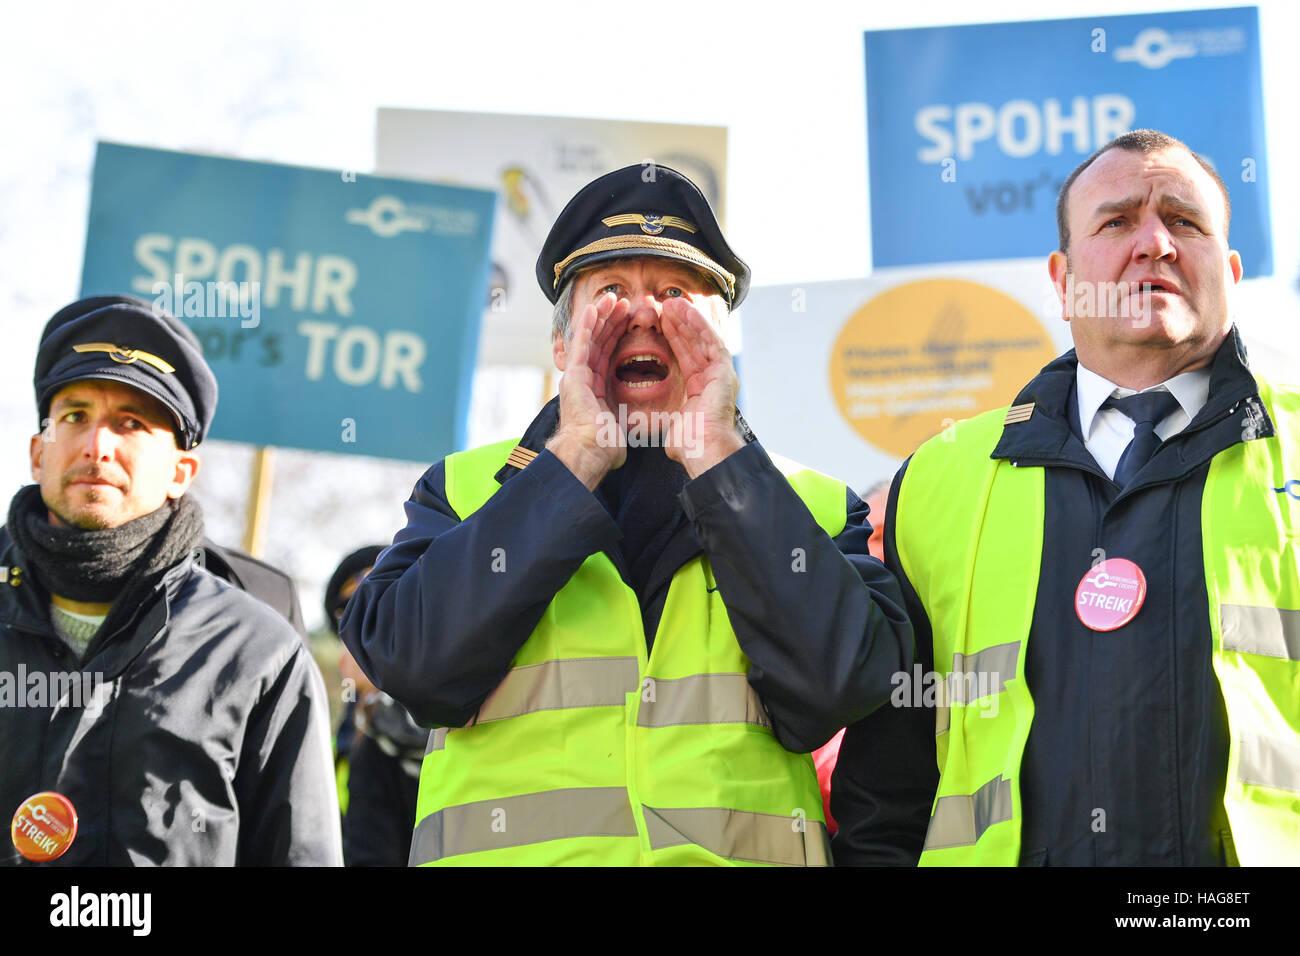 Frankfurt, Germany. 30th November, 2016. Lufthansa pilots taking part in a demonstration by pilots' union Vereinigung - Stock Image